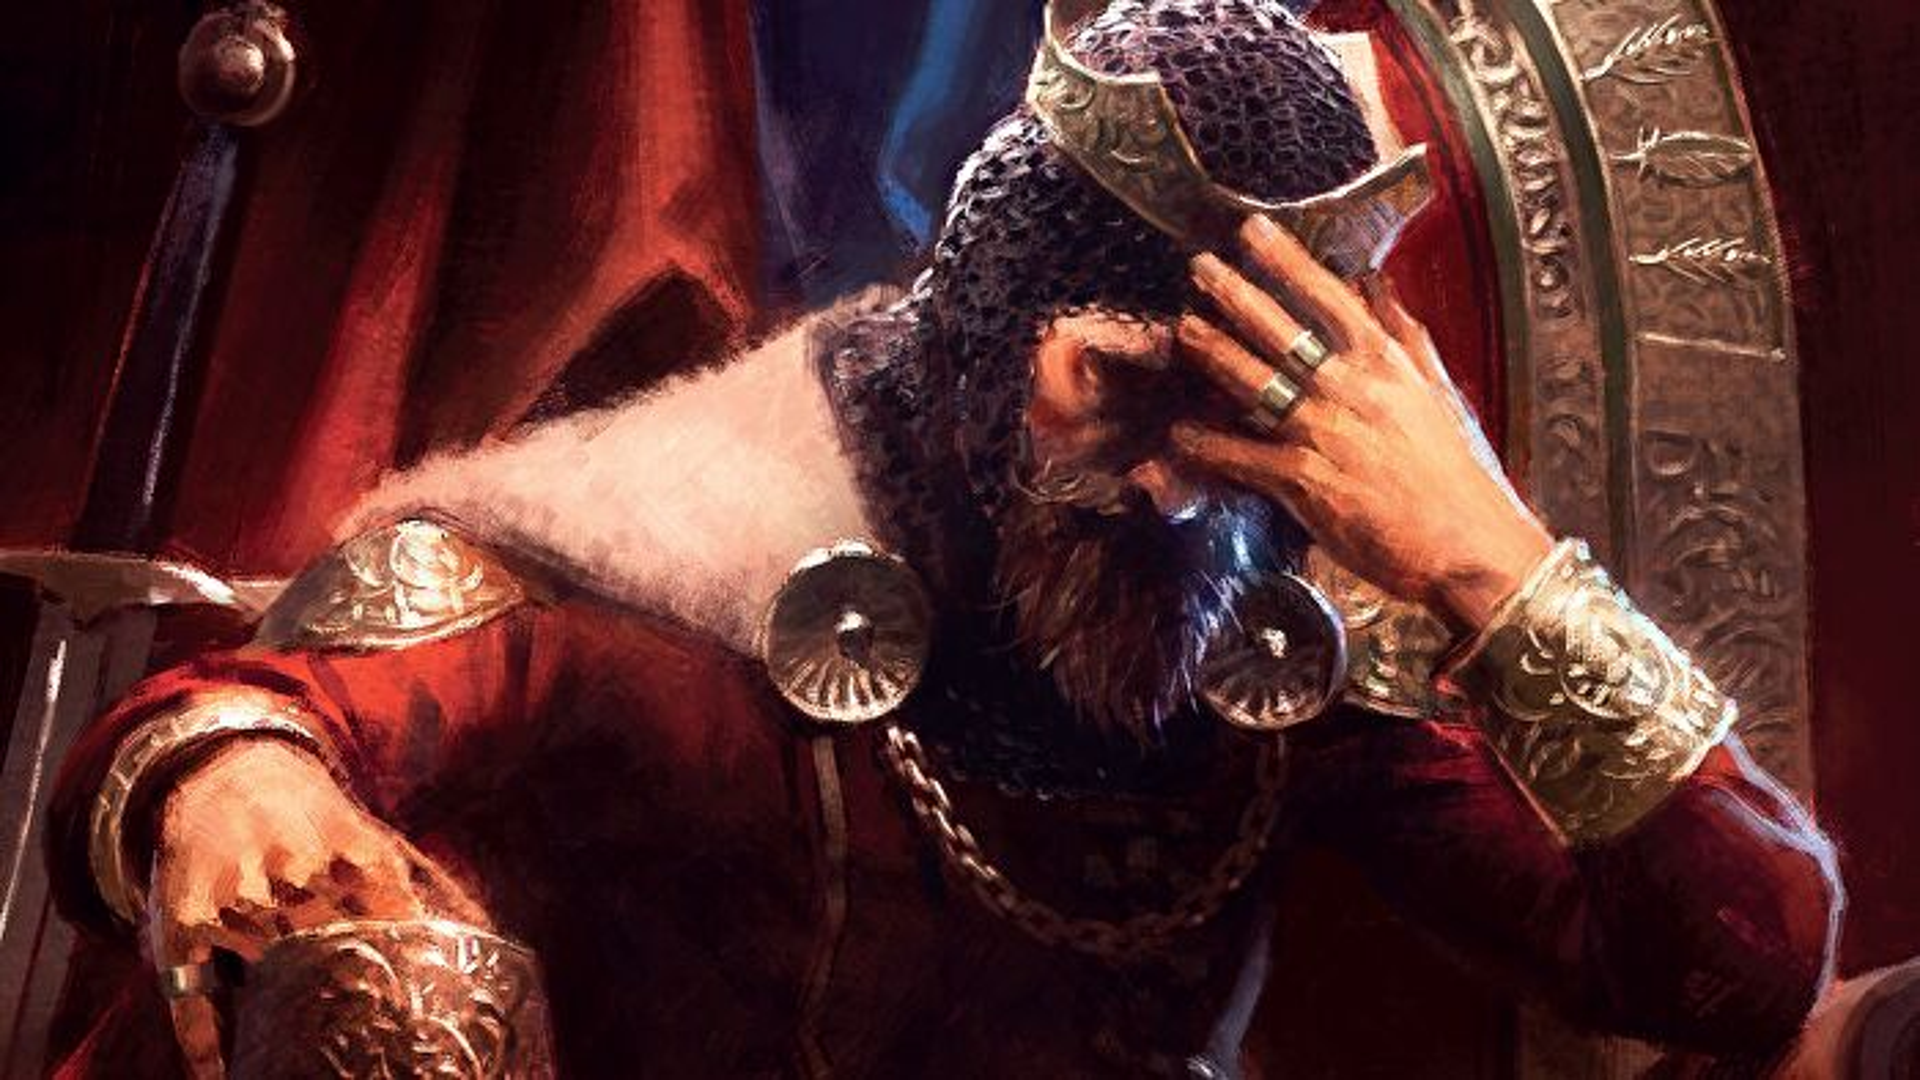 The King's Dilemma legacy board game box artwork